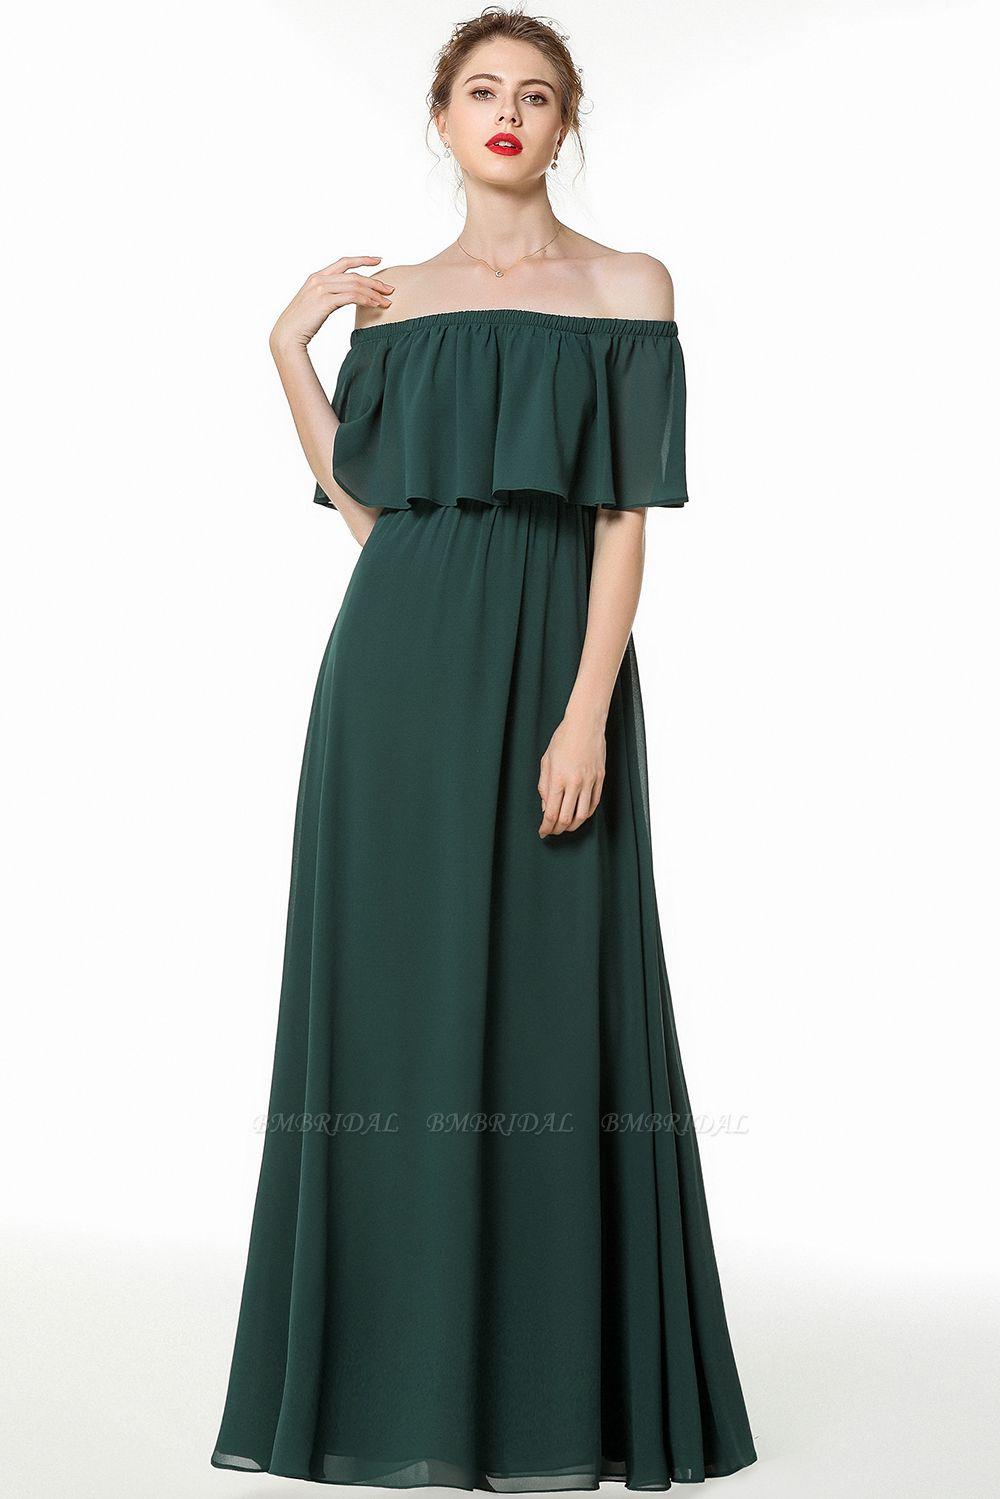 Gorgeous Chiffon Flounced Crinkle Cold-shoulder Long Bridesmaid Dresses Affordable